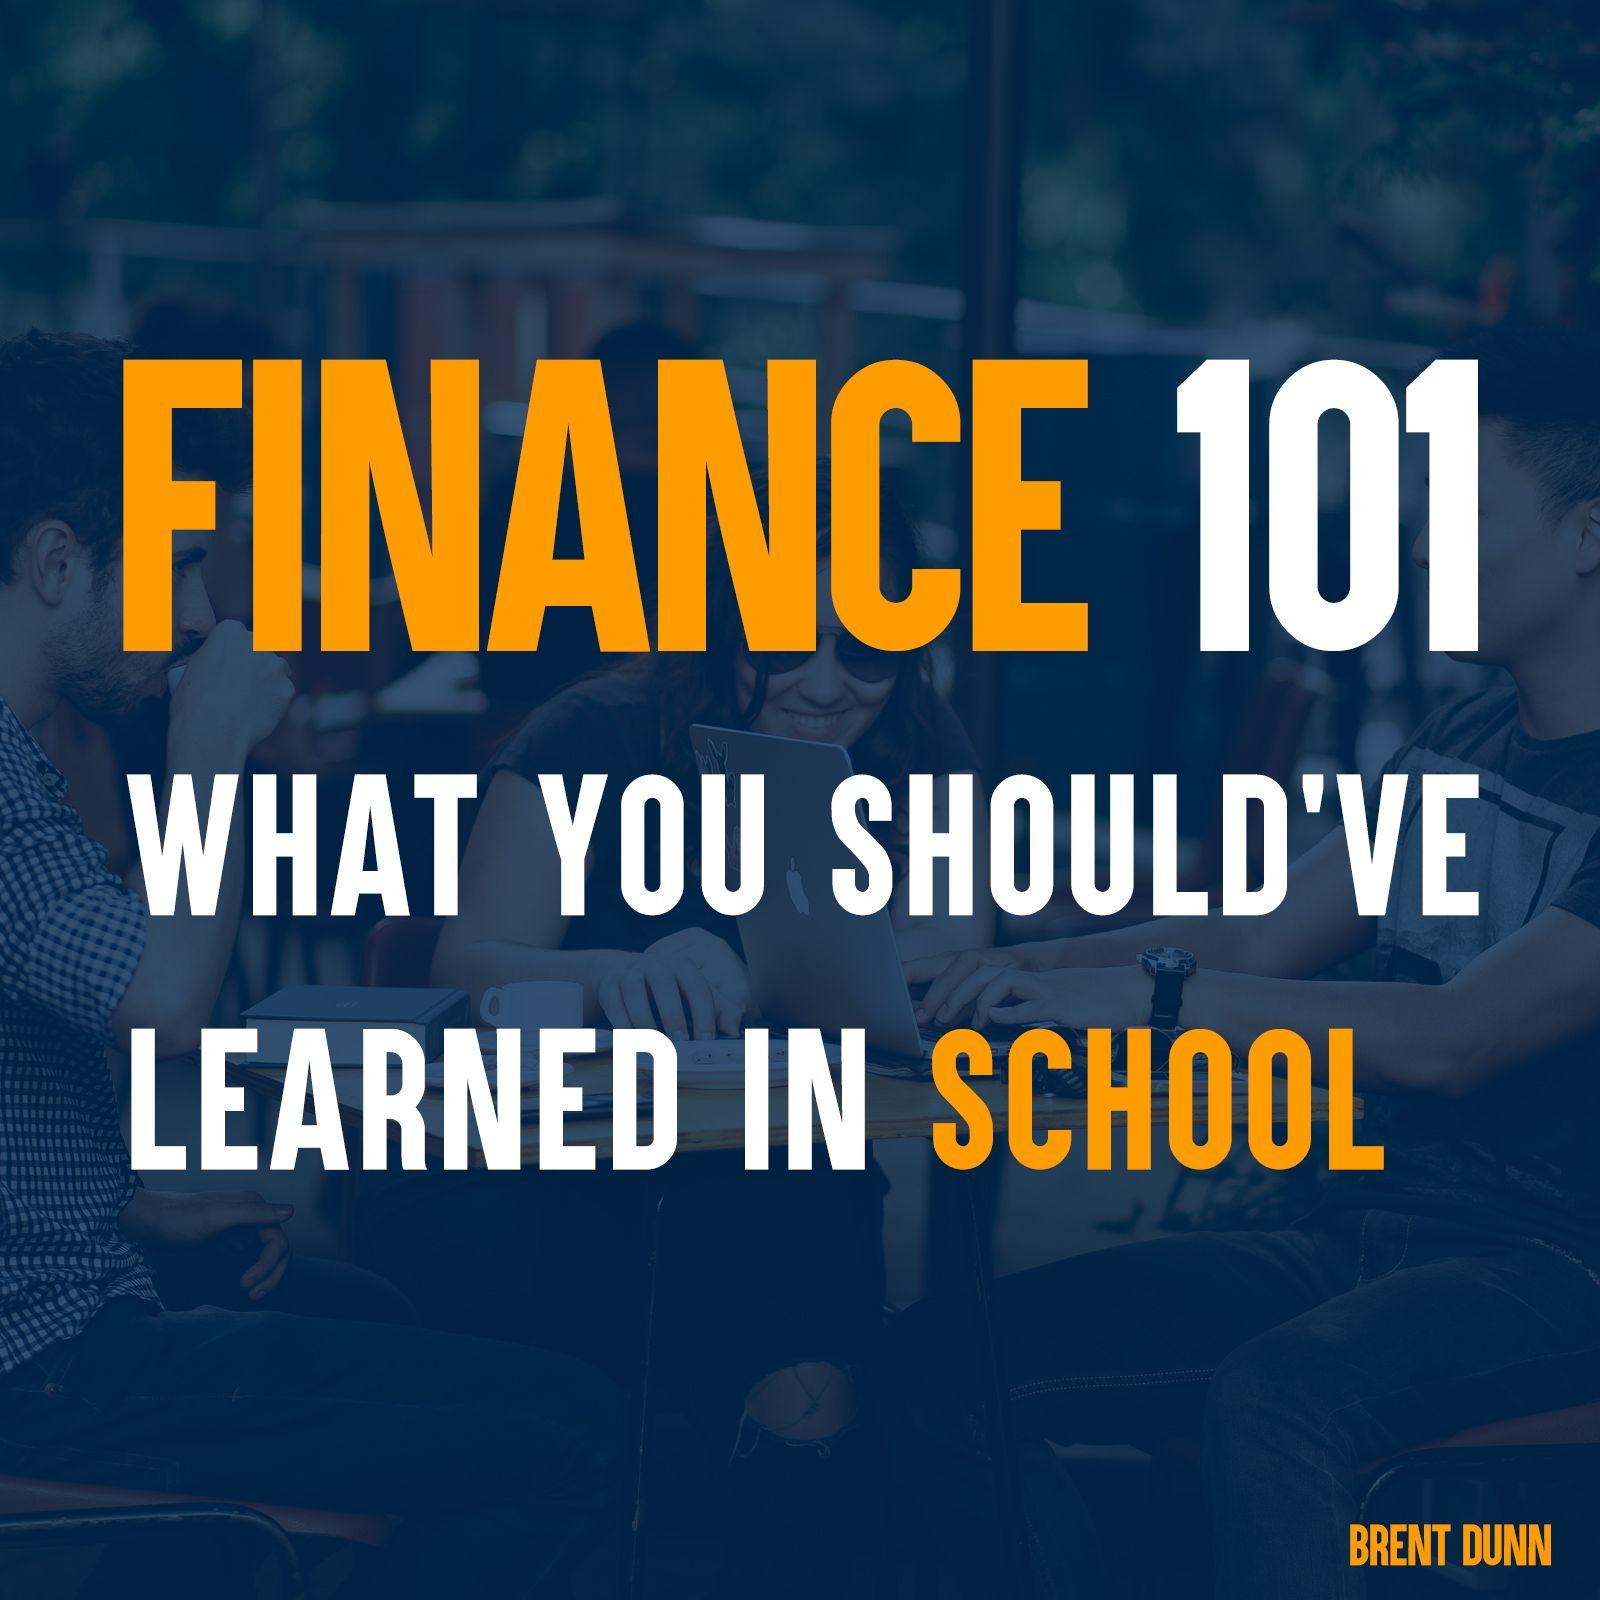 finance 101 magazine